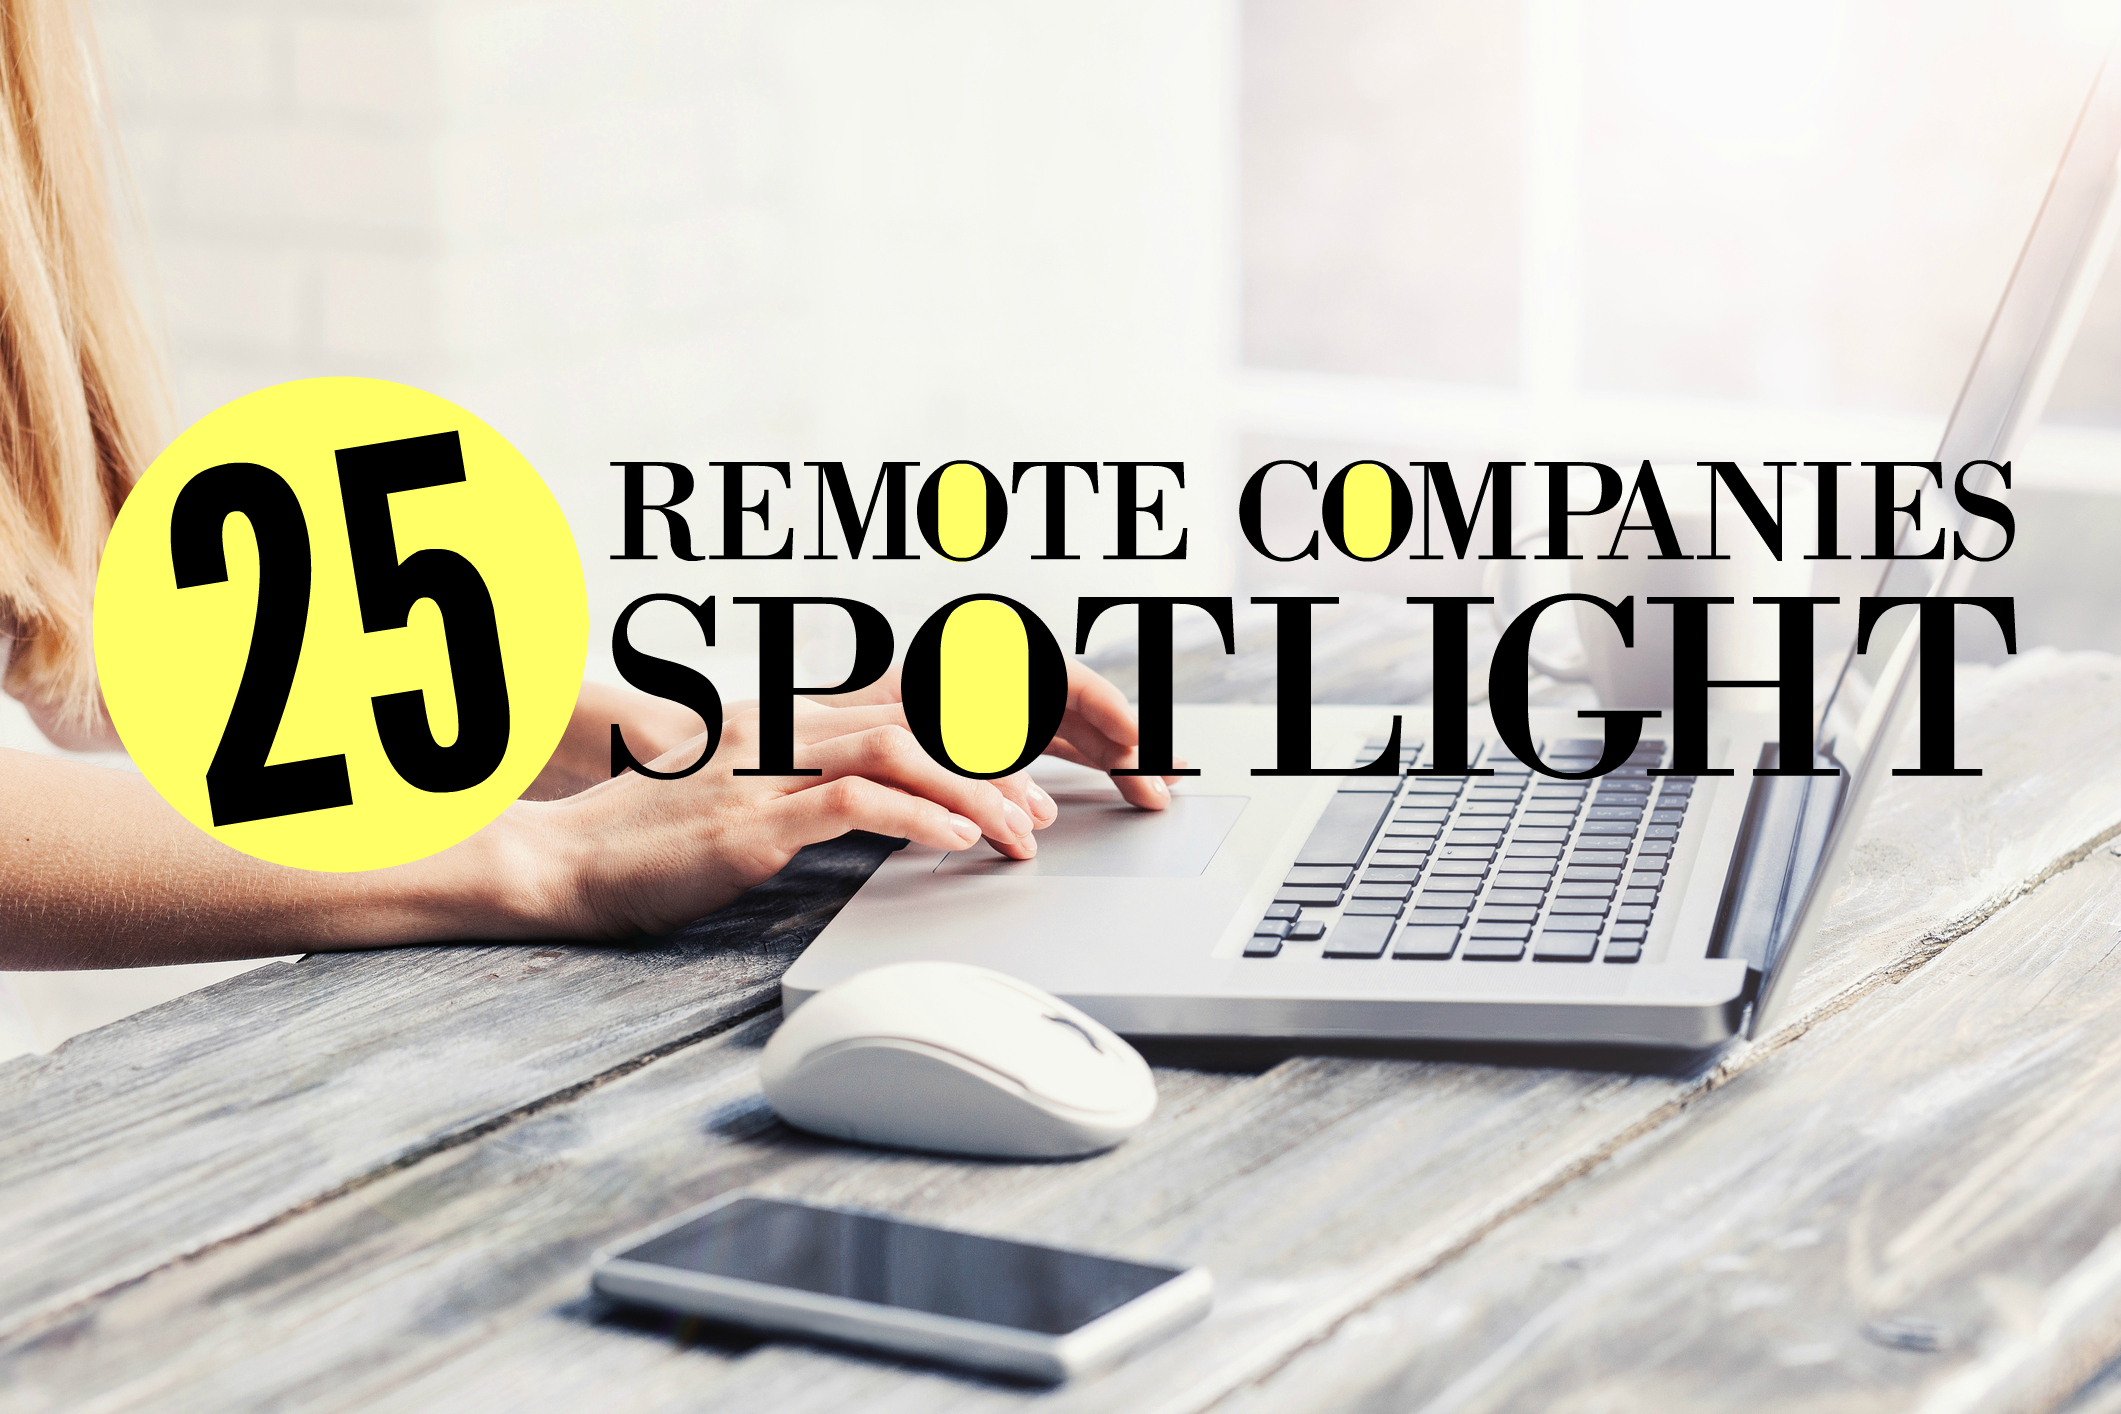 remote companies